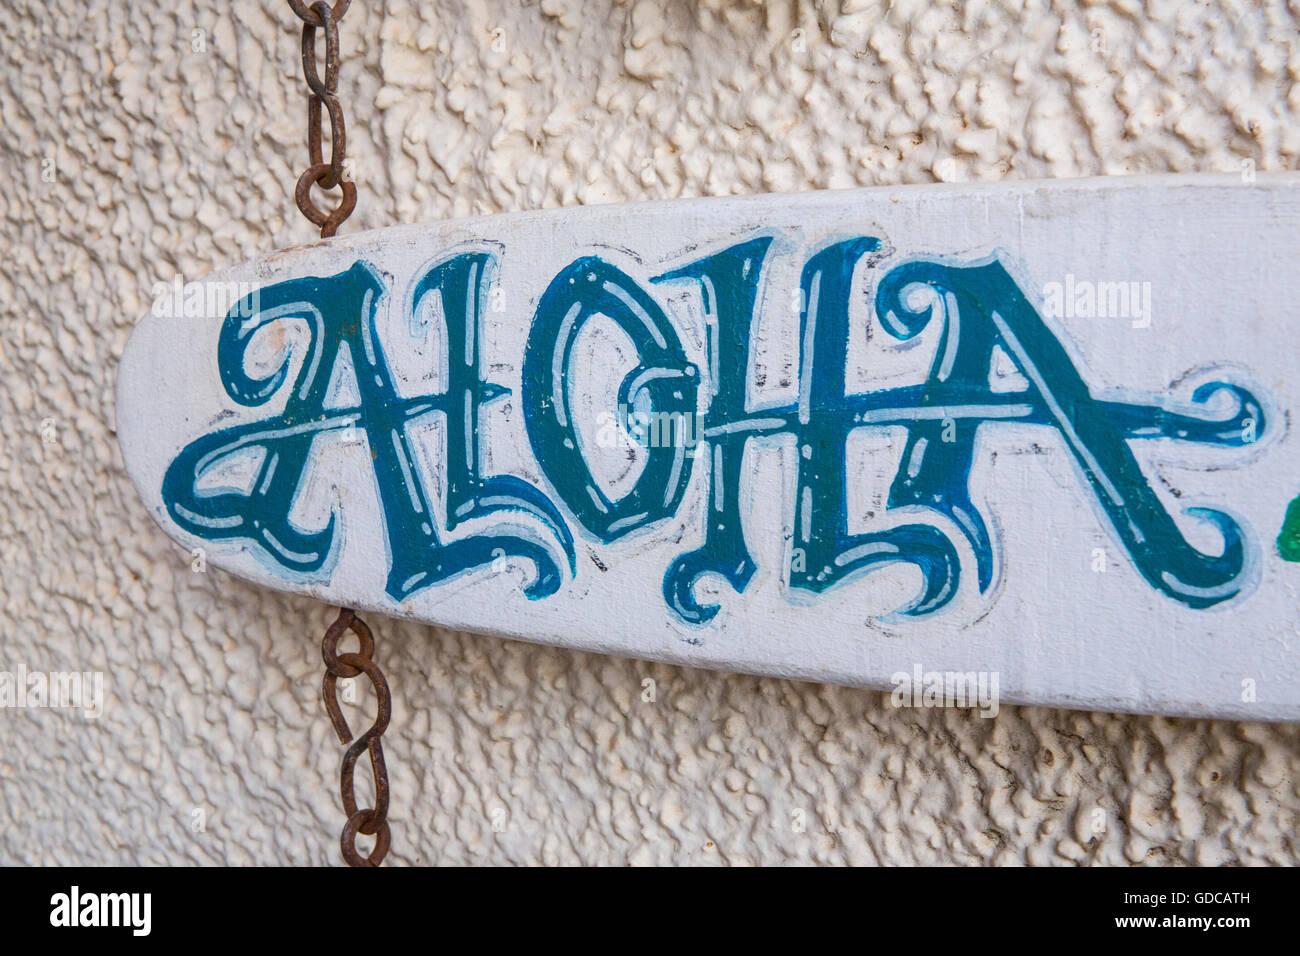 Maui,Aloha,board,USA,Hawaii,America,sign, - Stock Image